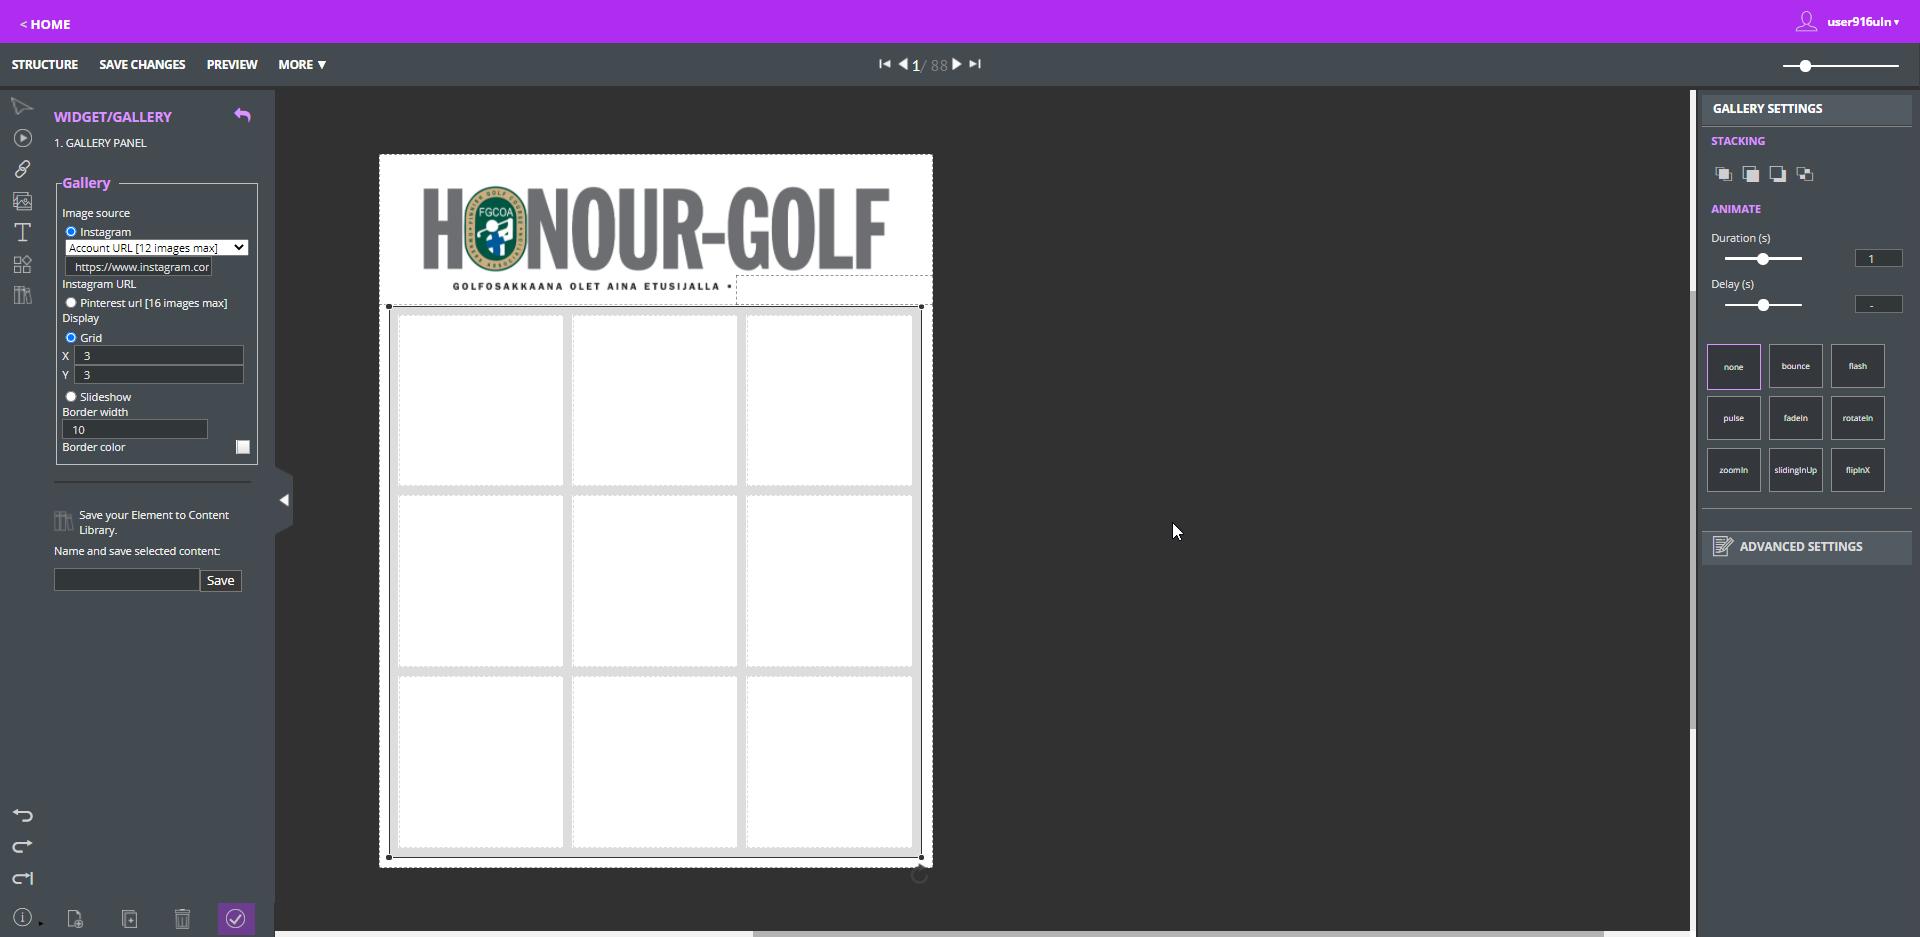 publisher_pro_interface4